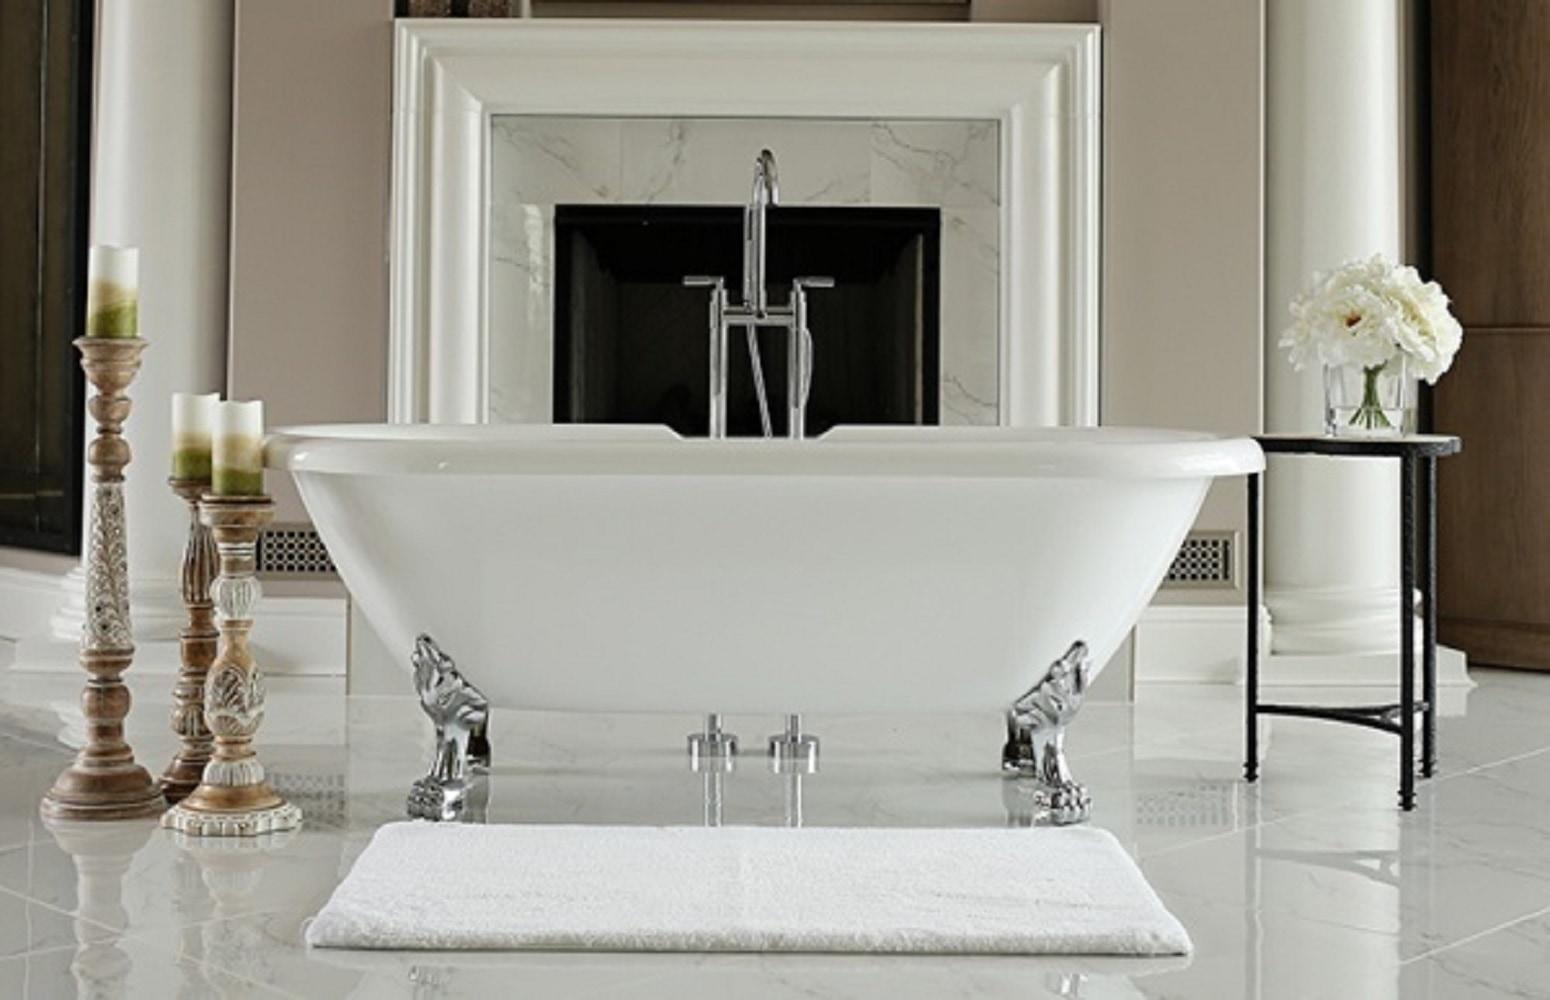 Freestanding tubs / 70x31.5x25 / Acrylic / LPIRES-FS Signature Bath/Freestanding Tubs 0